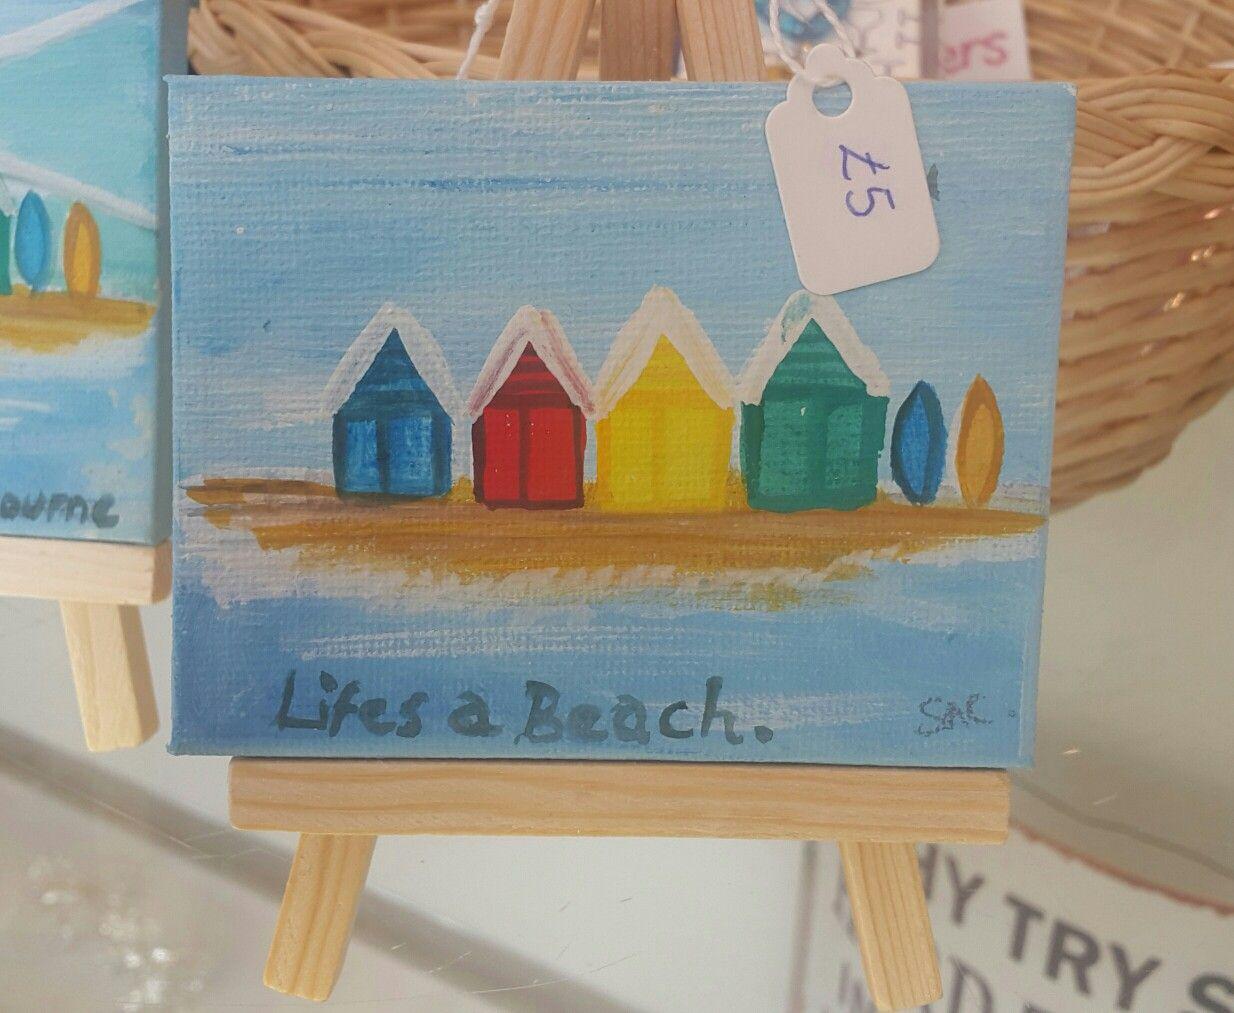 Original artwork on mini easels. #beach #southbourne. #beachhuts